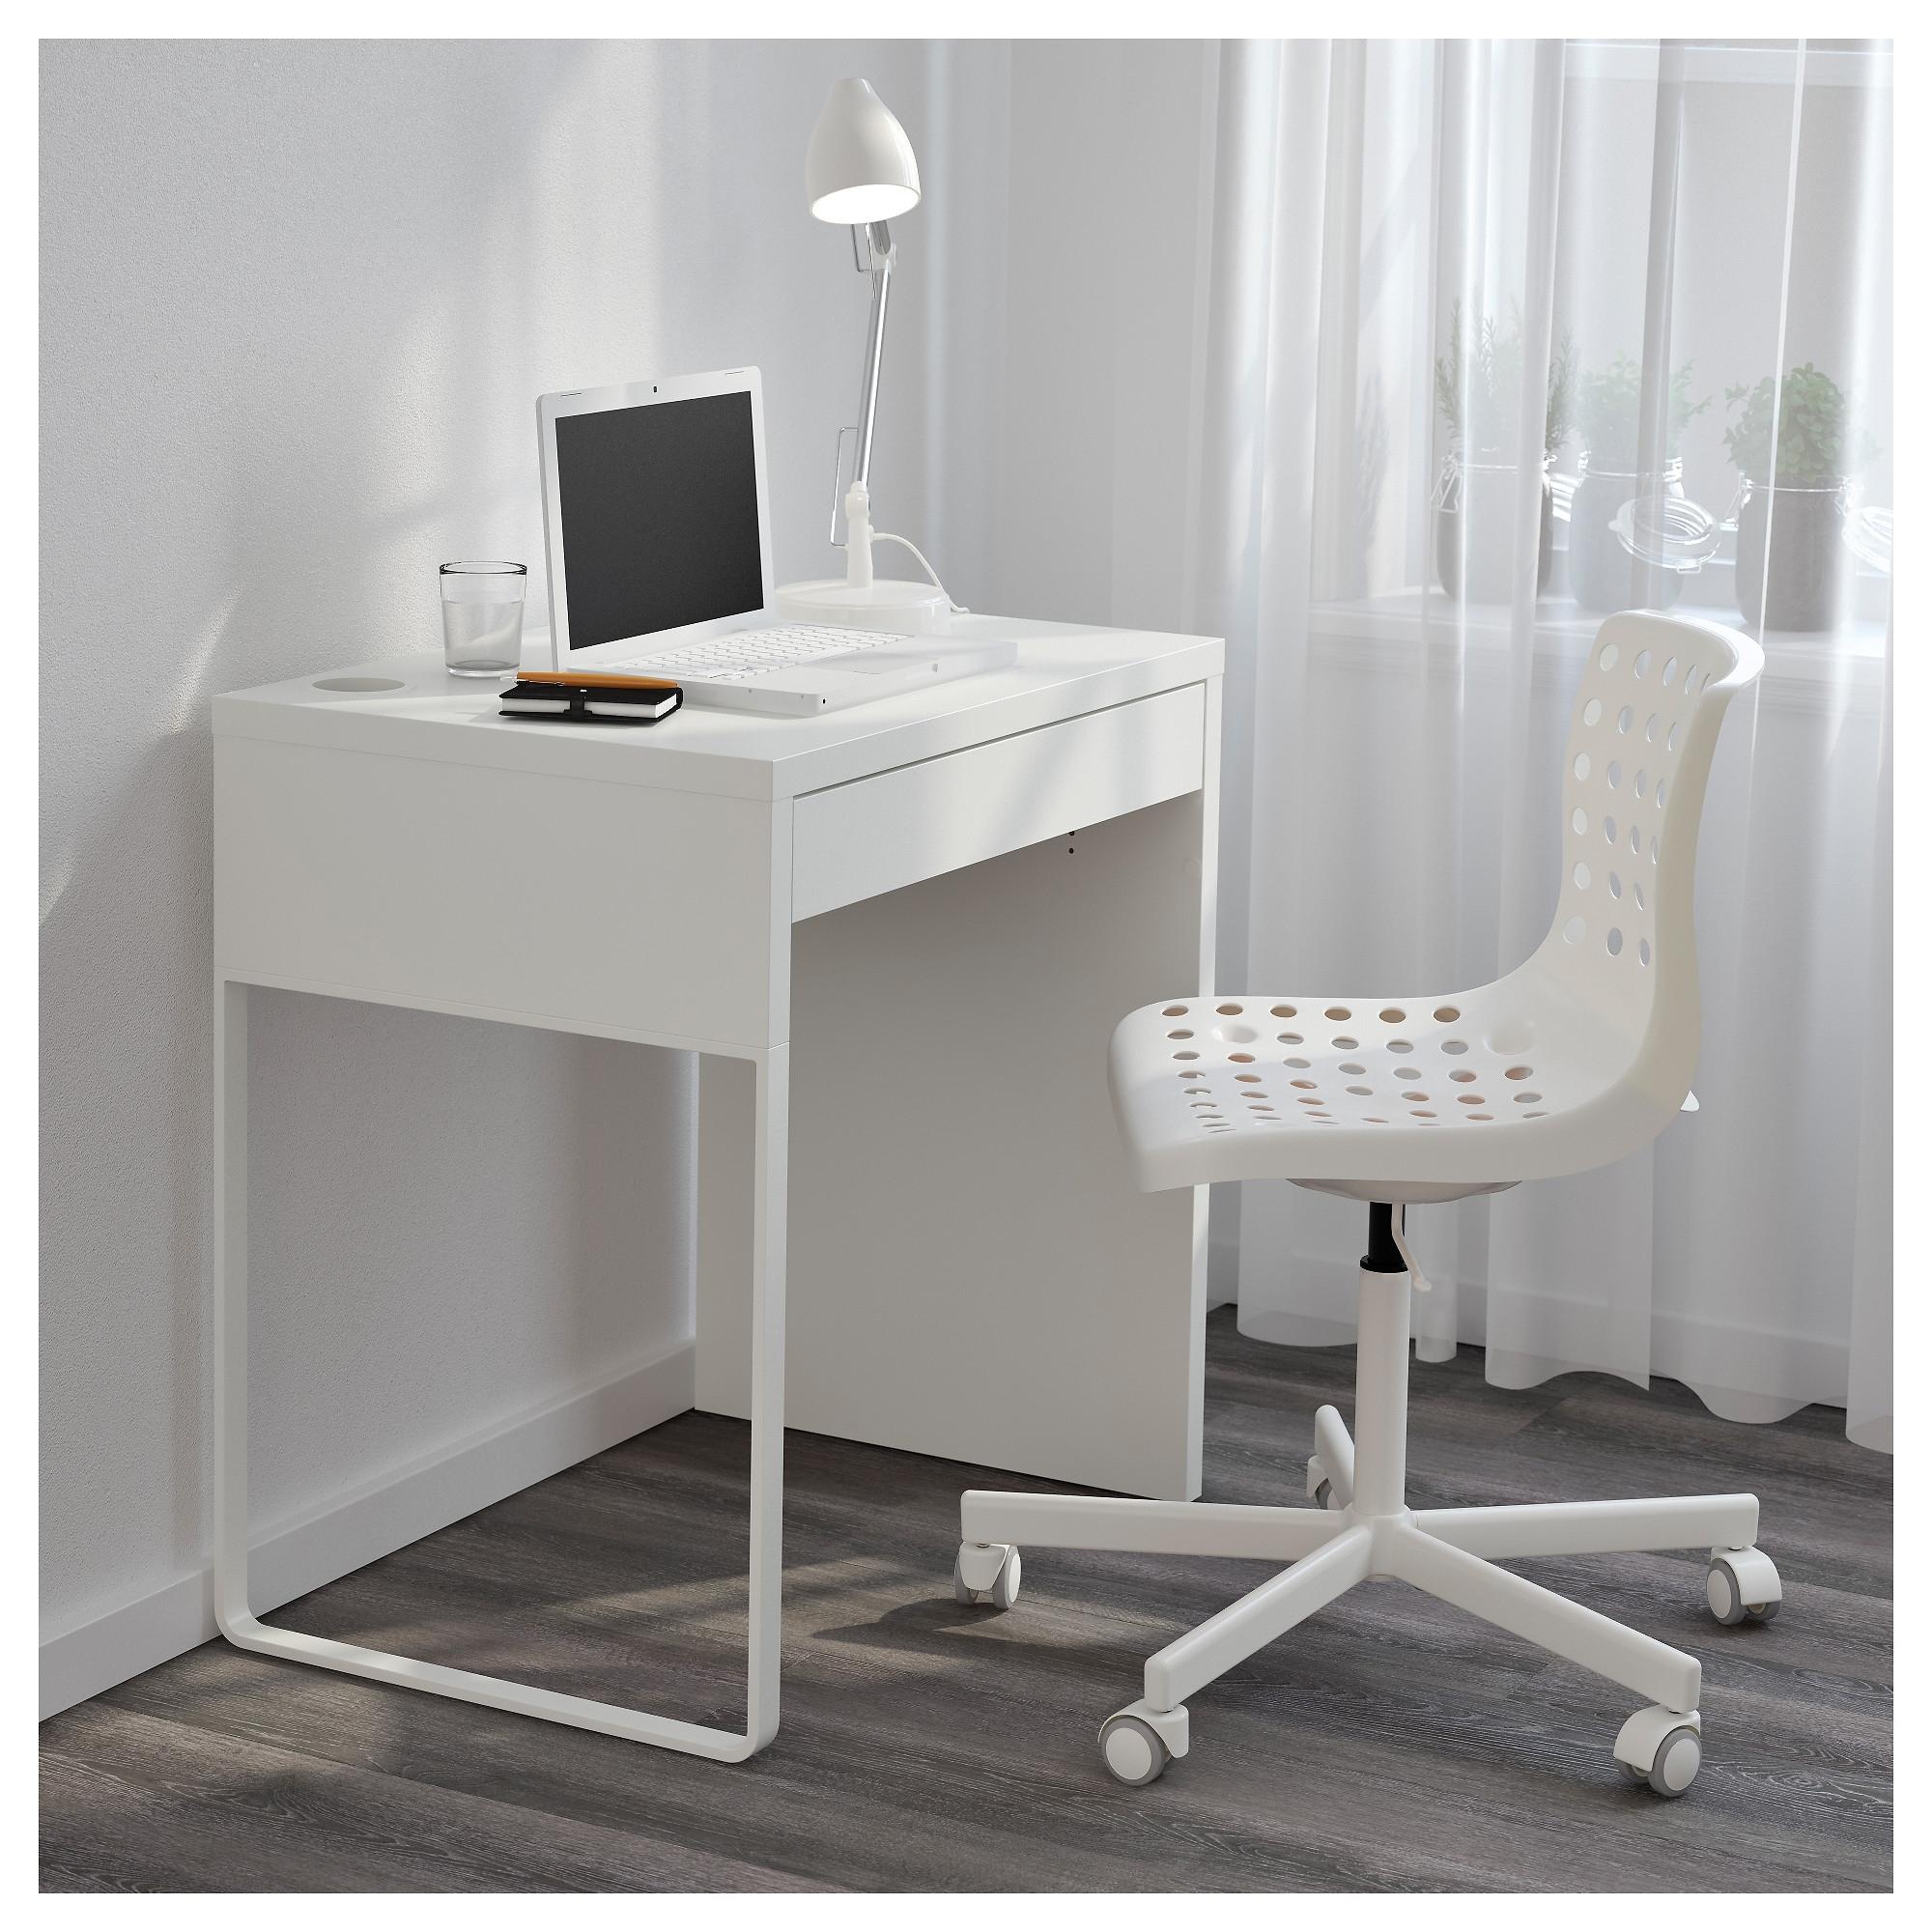 2019 Micke Desk – White – Ikea Throughout Ikea Mn Computer Desks (View 1 of 20)